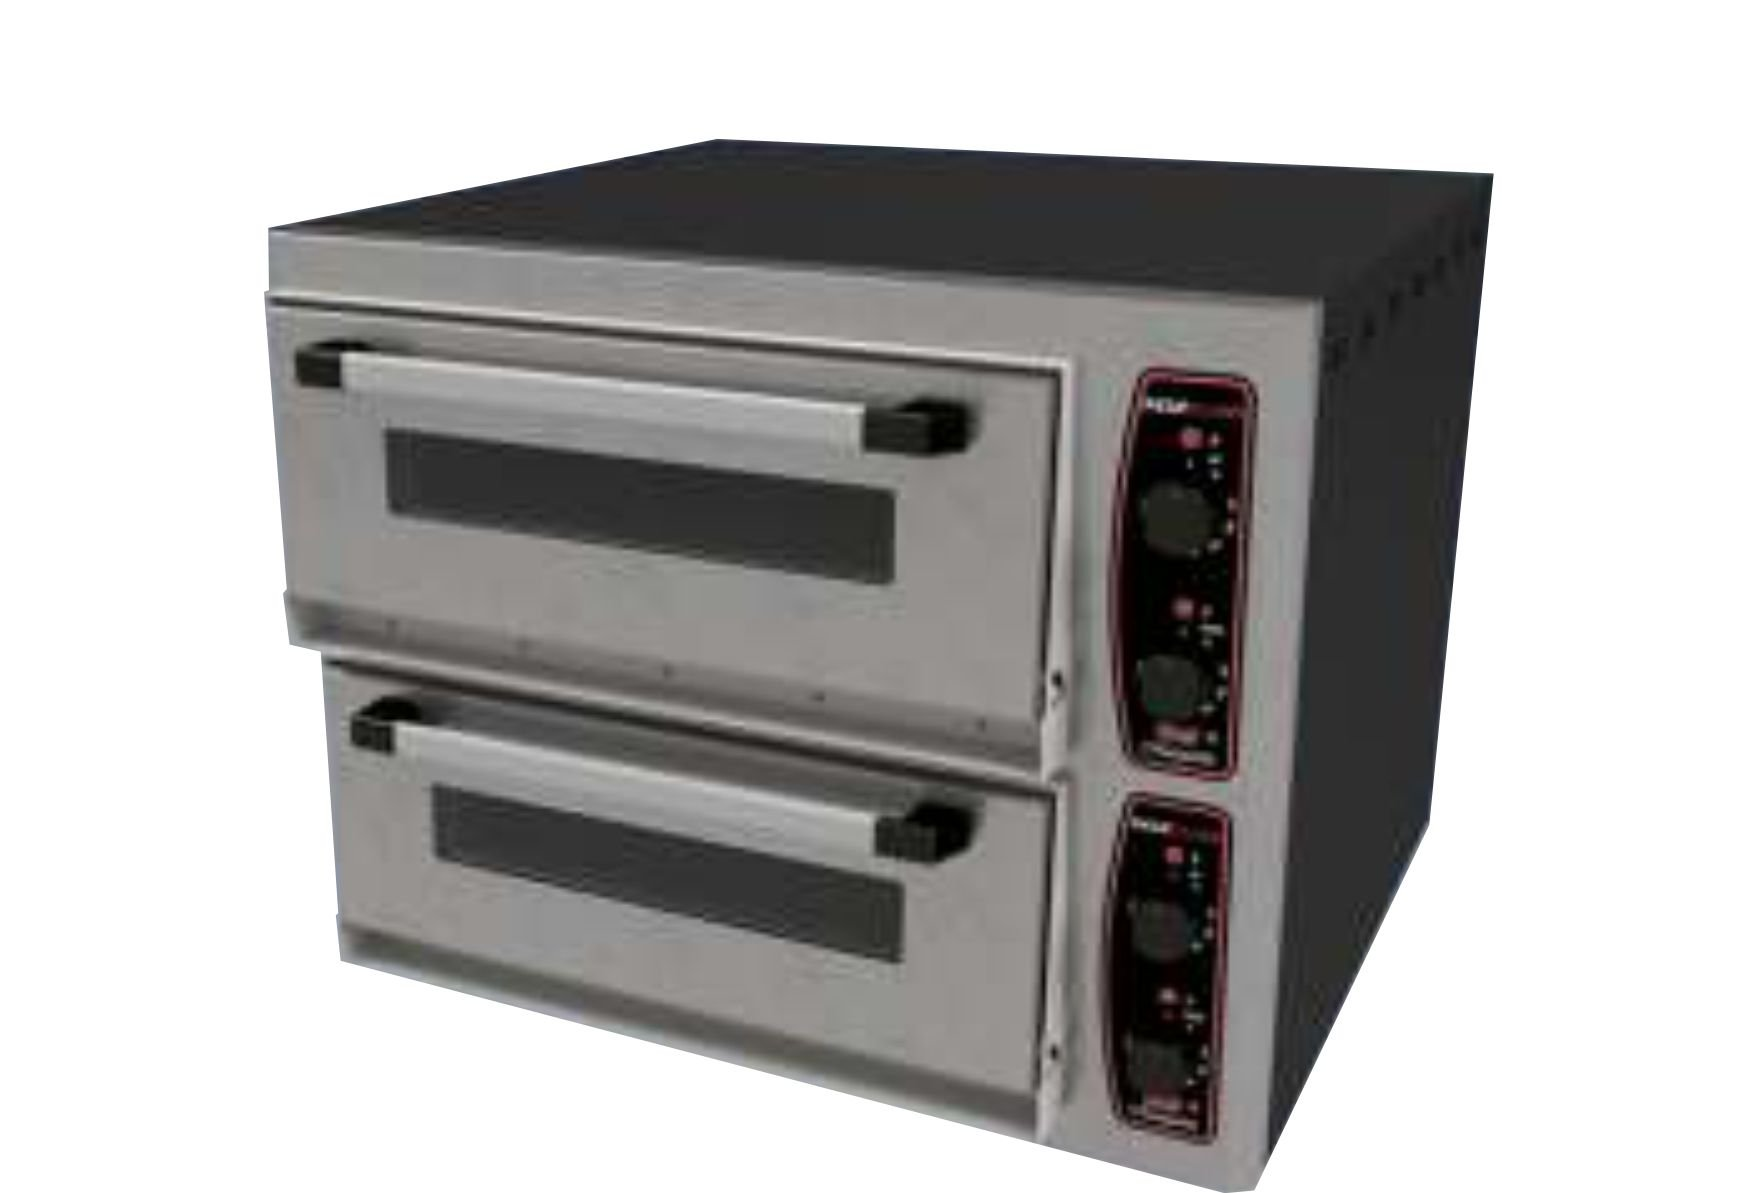 senox-m-600-serisi-pizza-firinlari